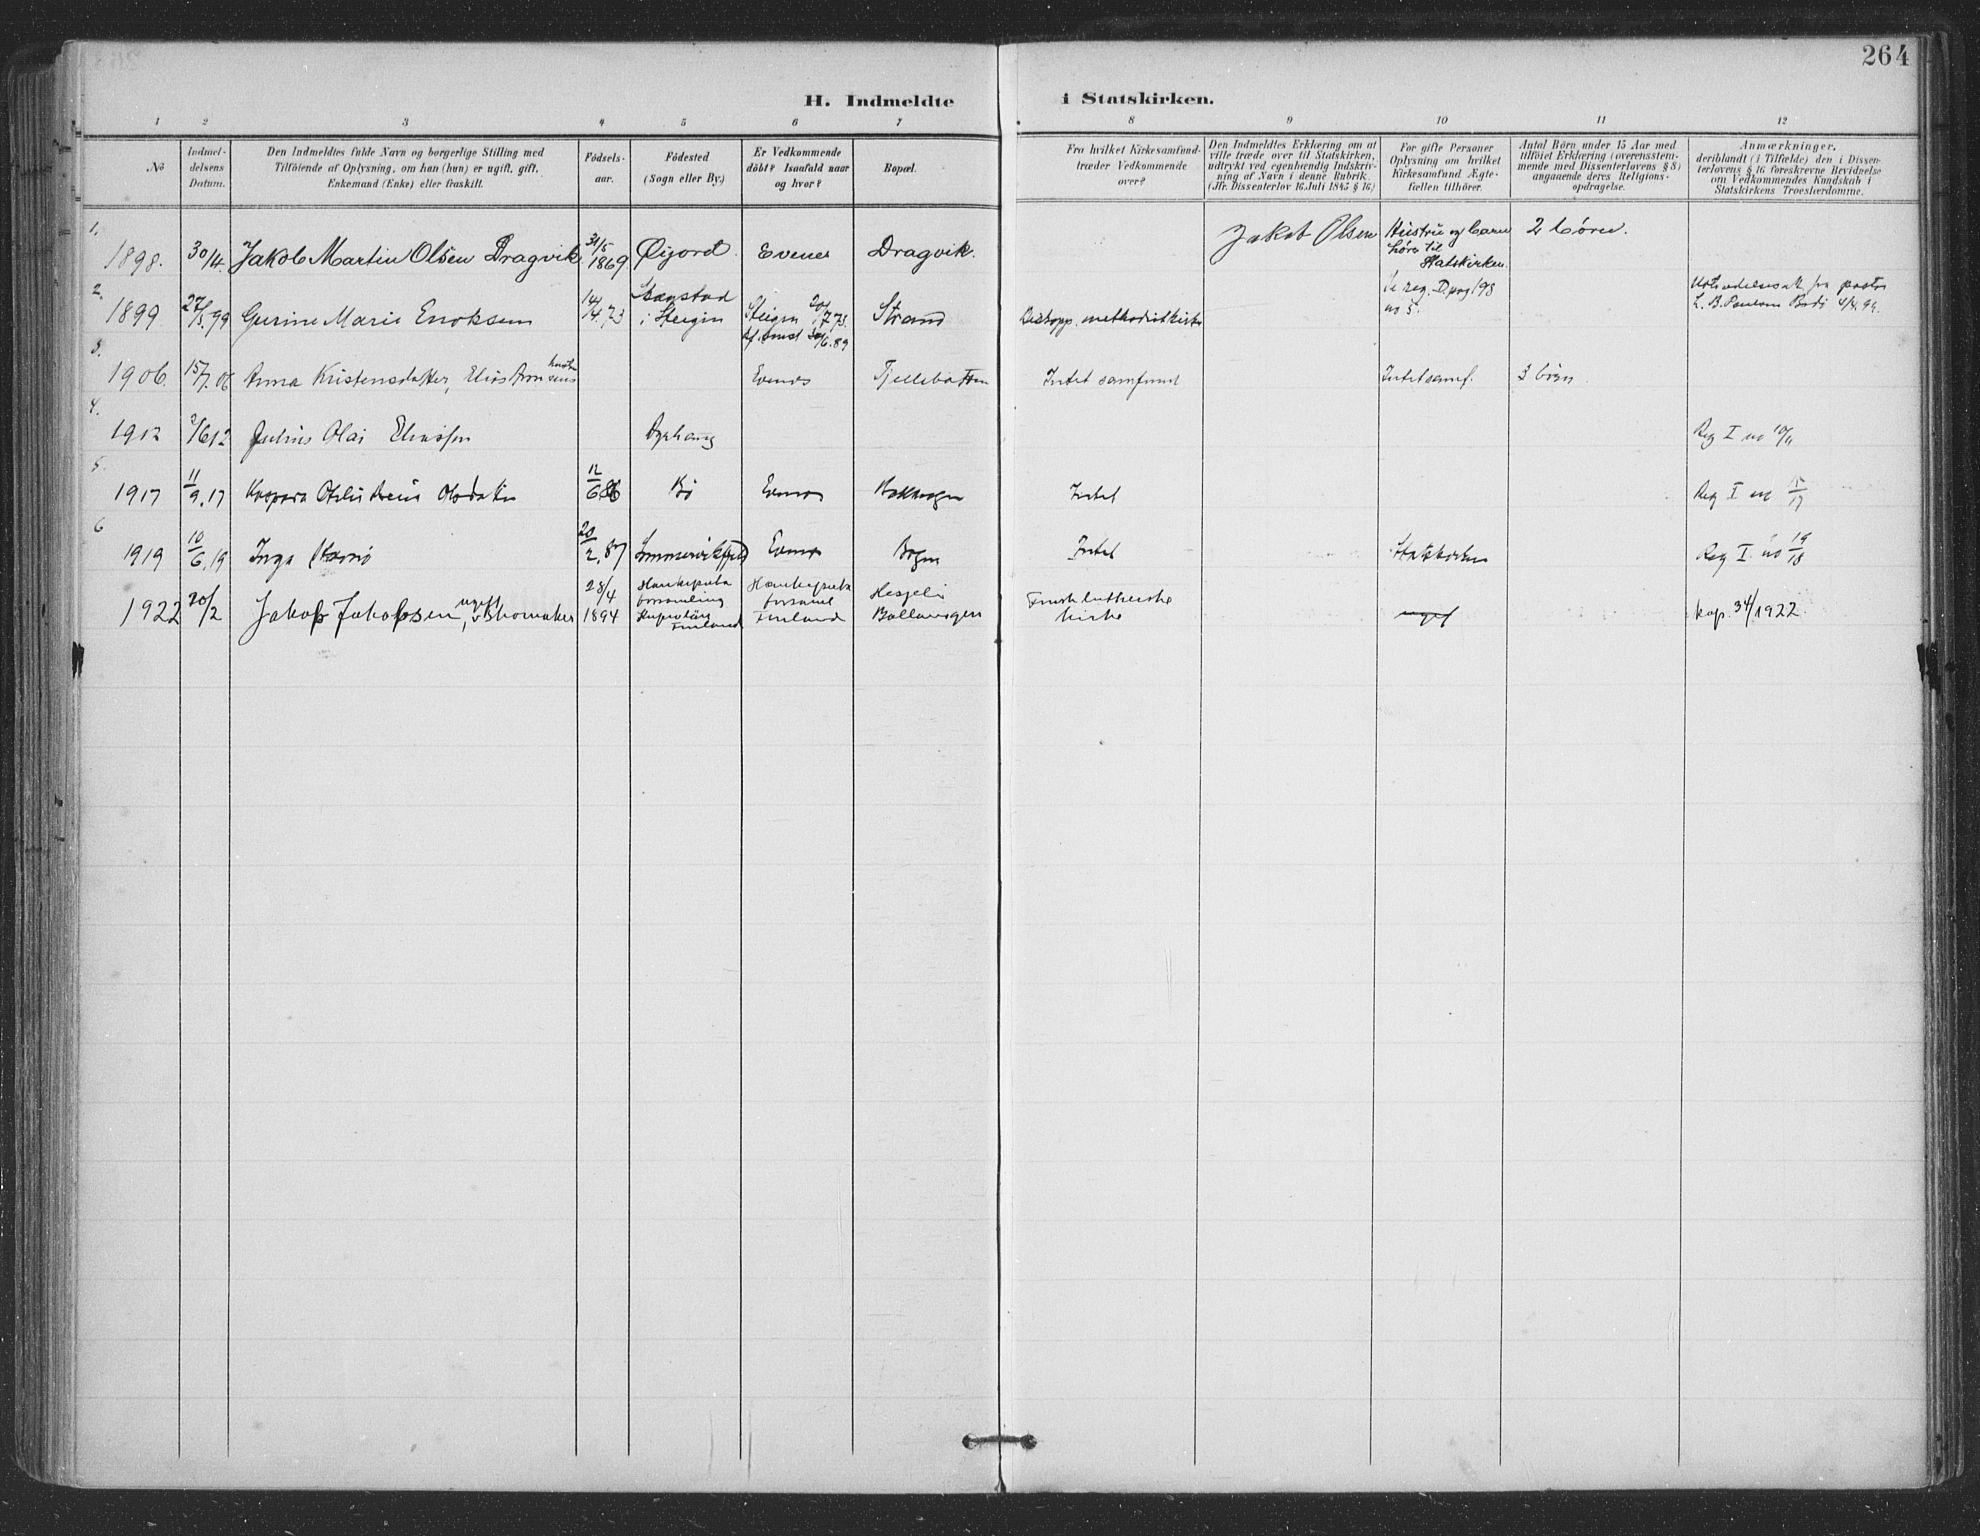 SAT, Ministerialprotokoller, klokkerbøker og fødselsregistre - Nordland, 863/L0899: Ministerialbok nr. 863A11, 1897-1906, s. 264